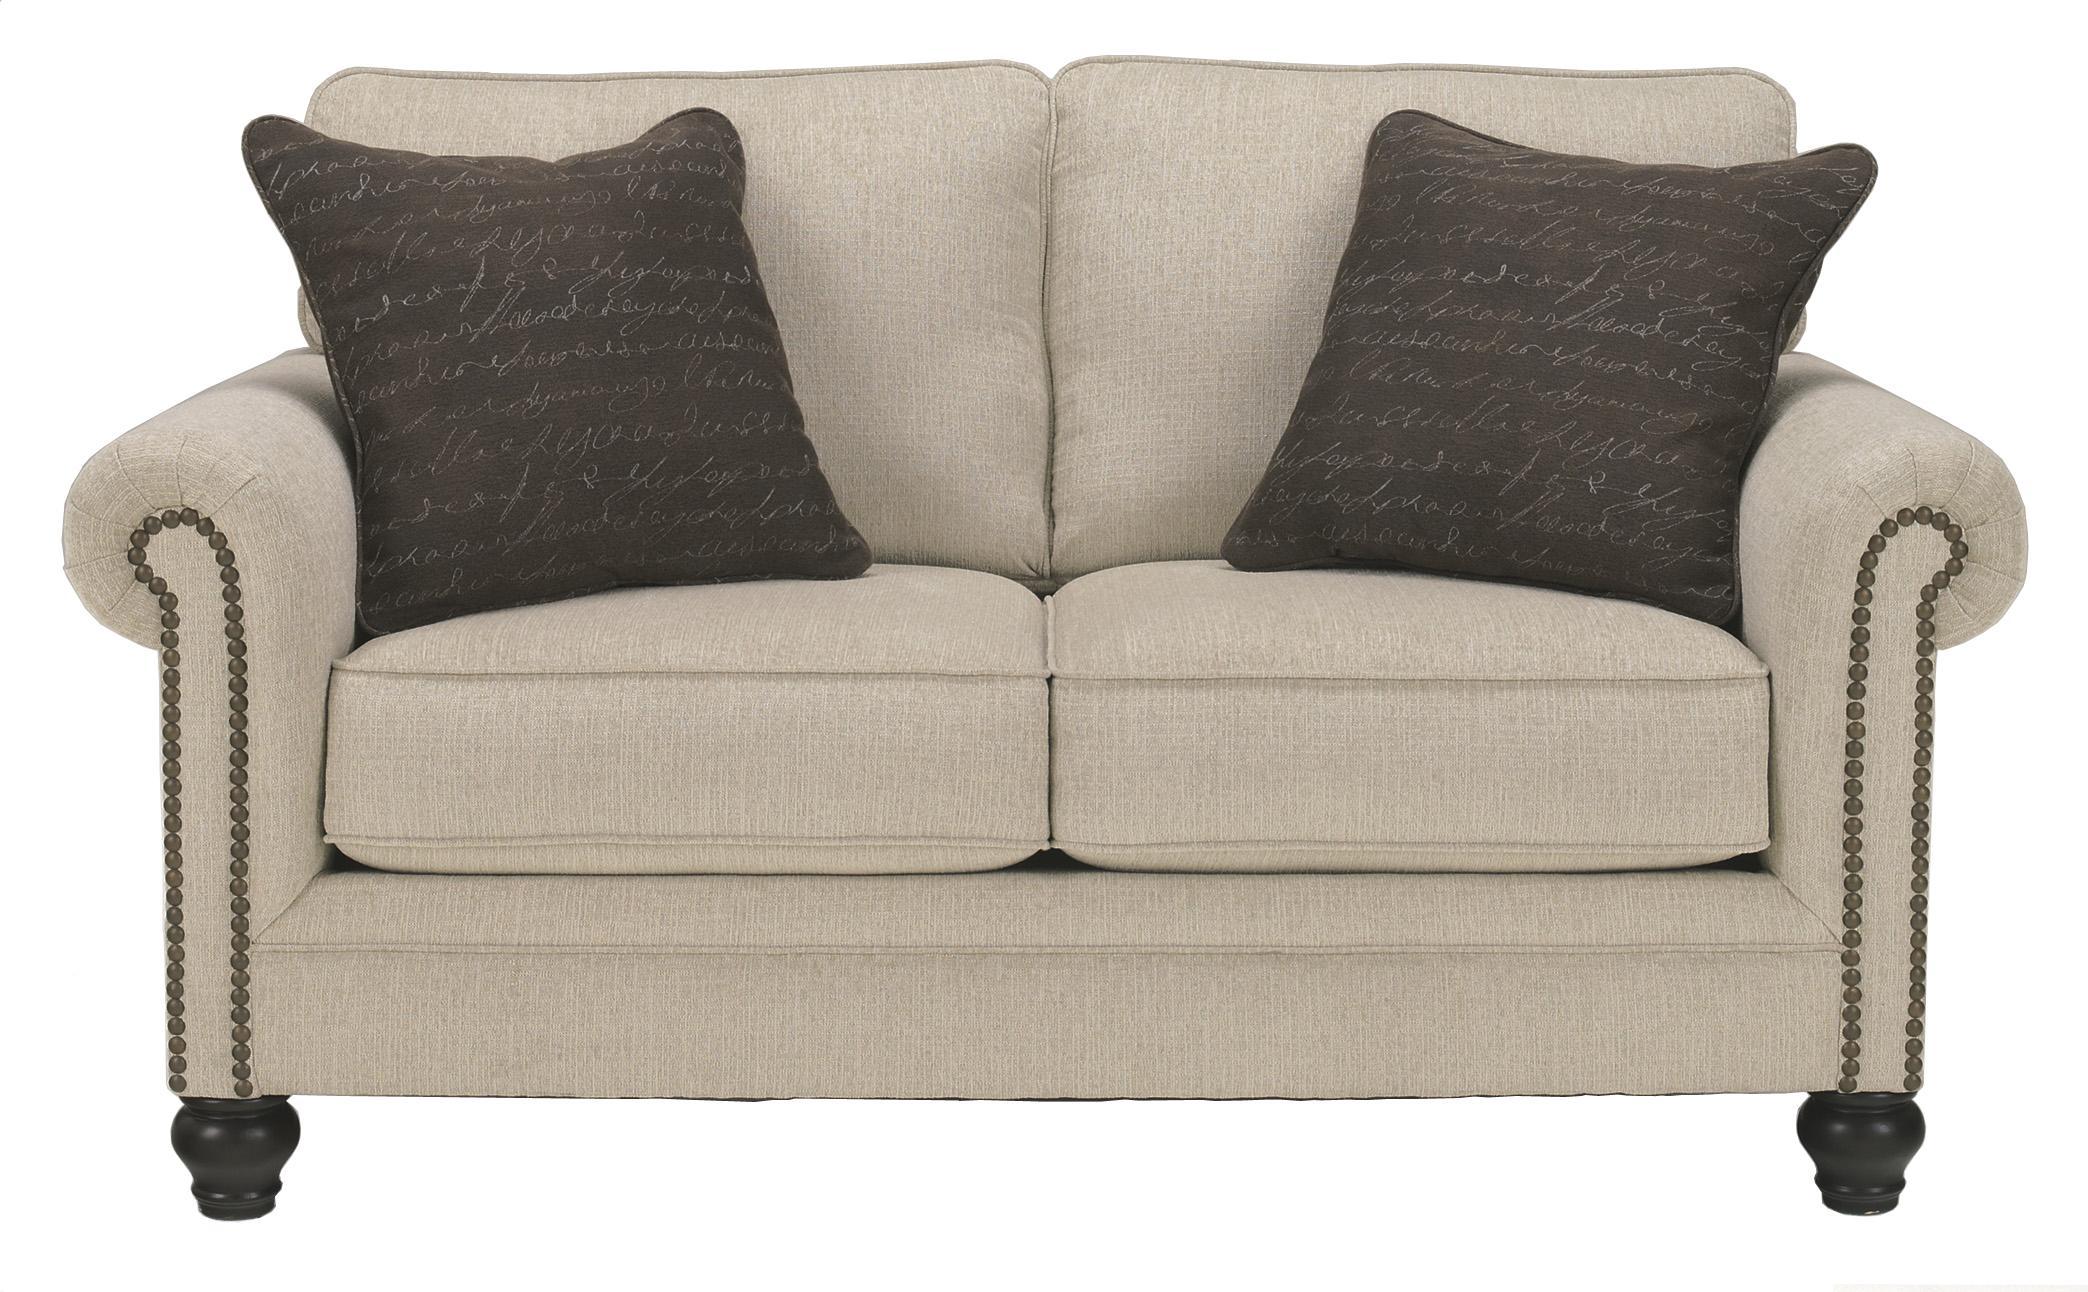 Milari - Linen Loveseat by Signature Design by Ashley at Lapeer Furniture & Mattress Center